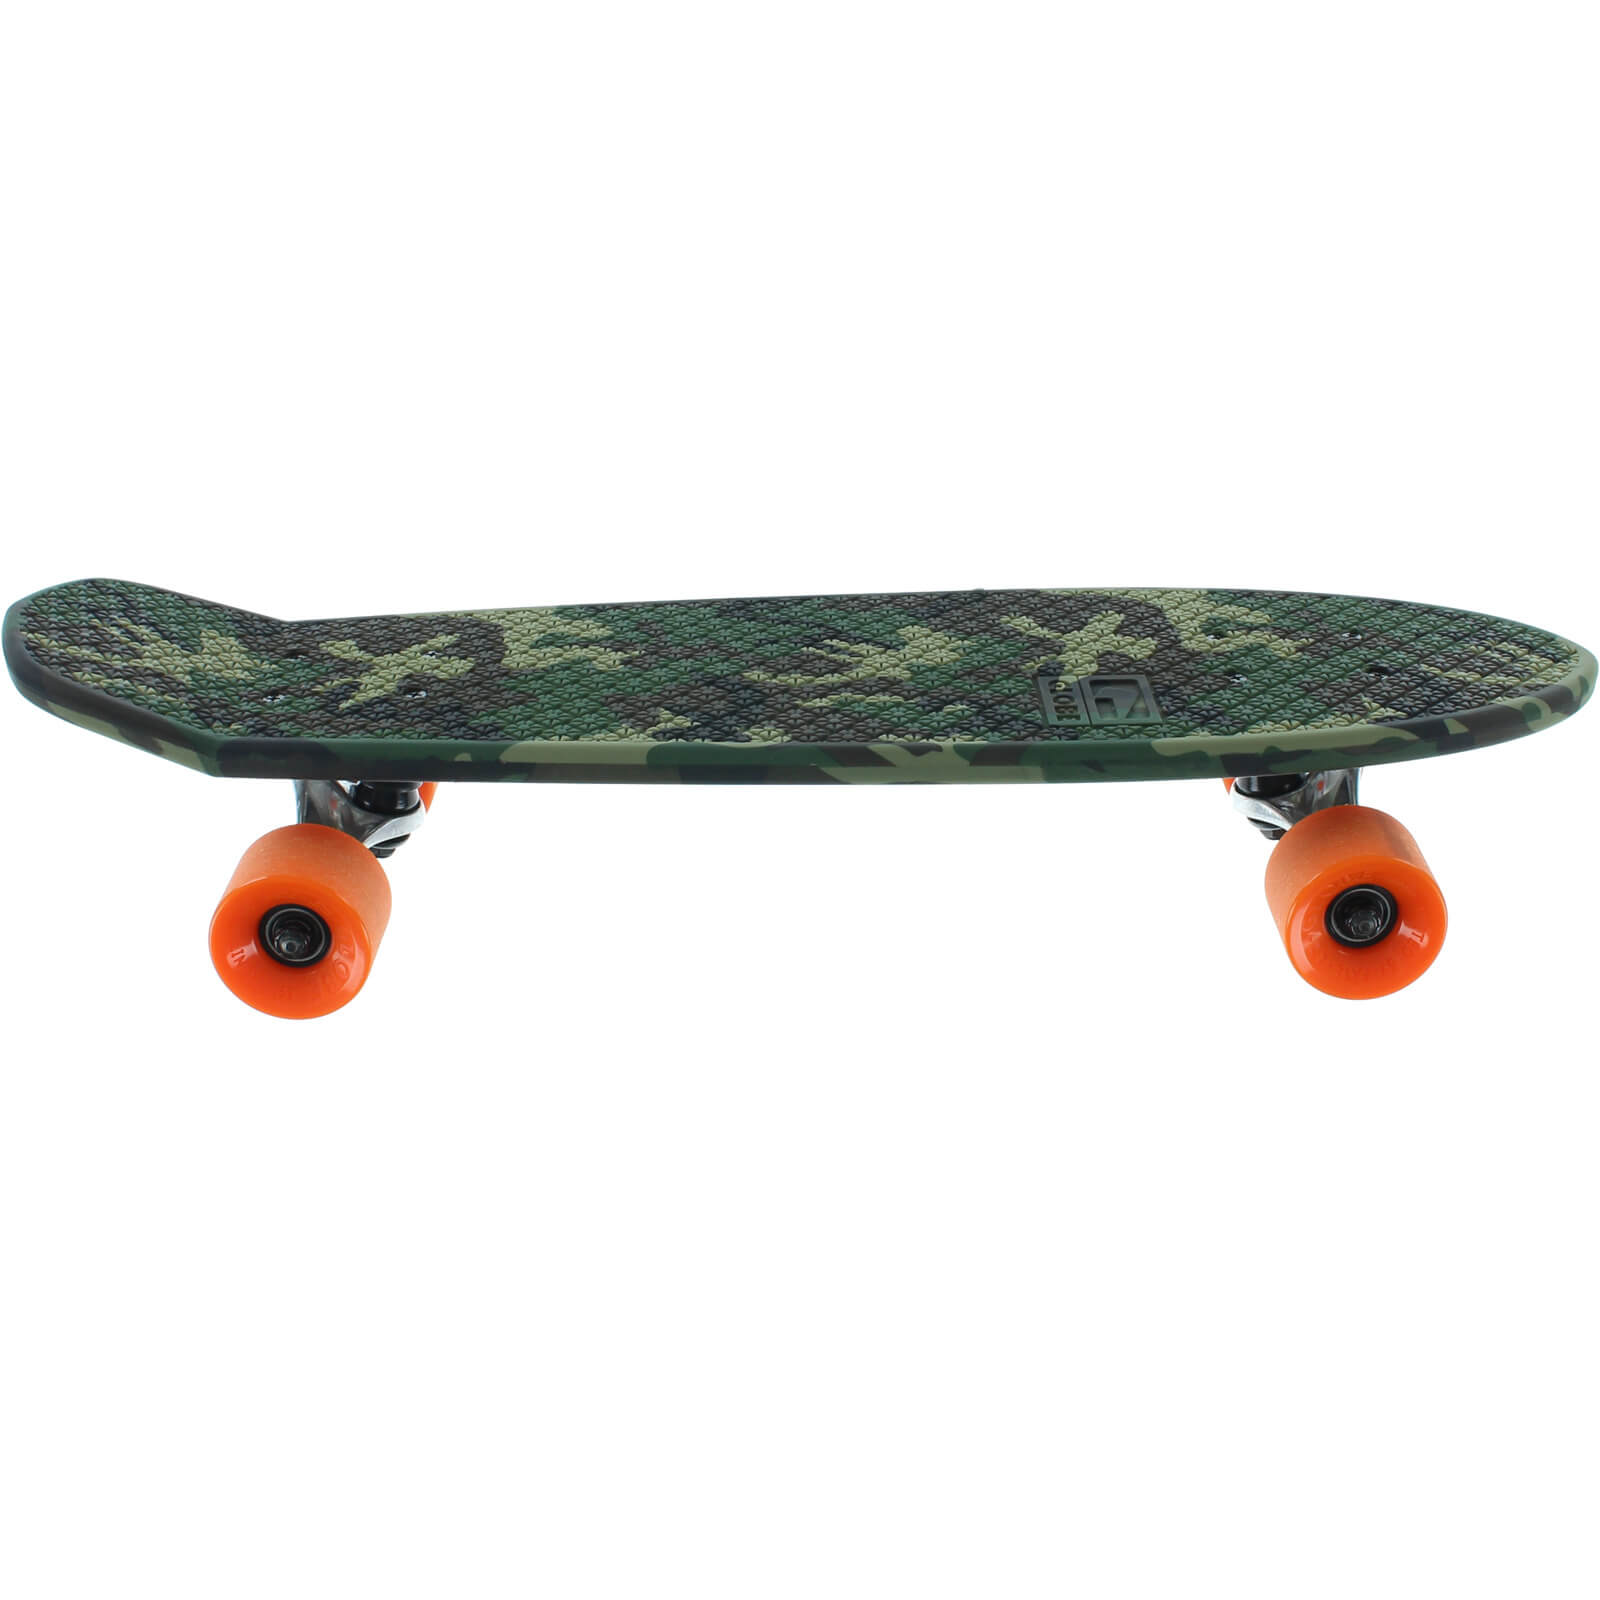 Globe Bantam Graphic Camo Orange Complete Skateboard 7